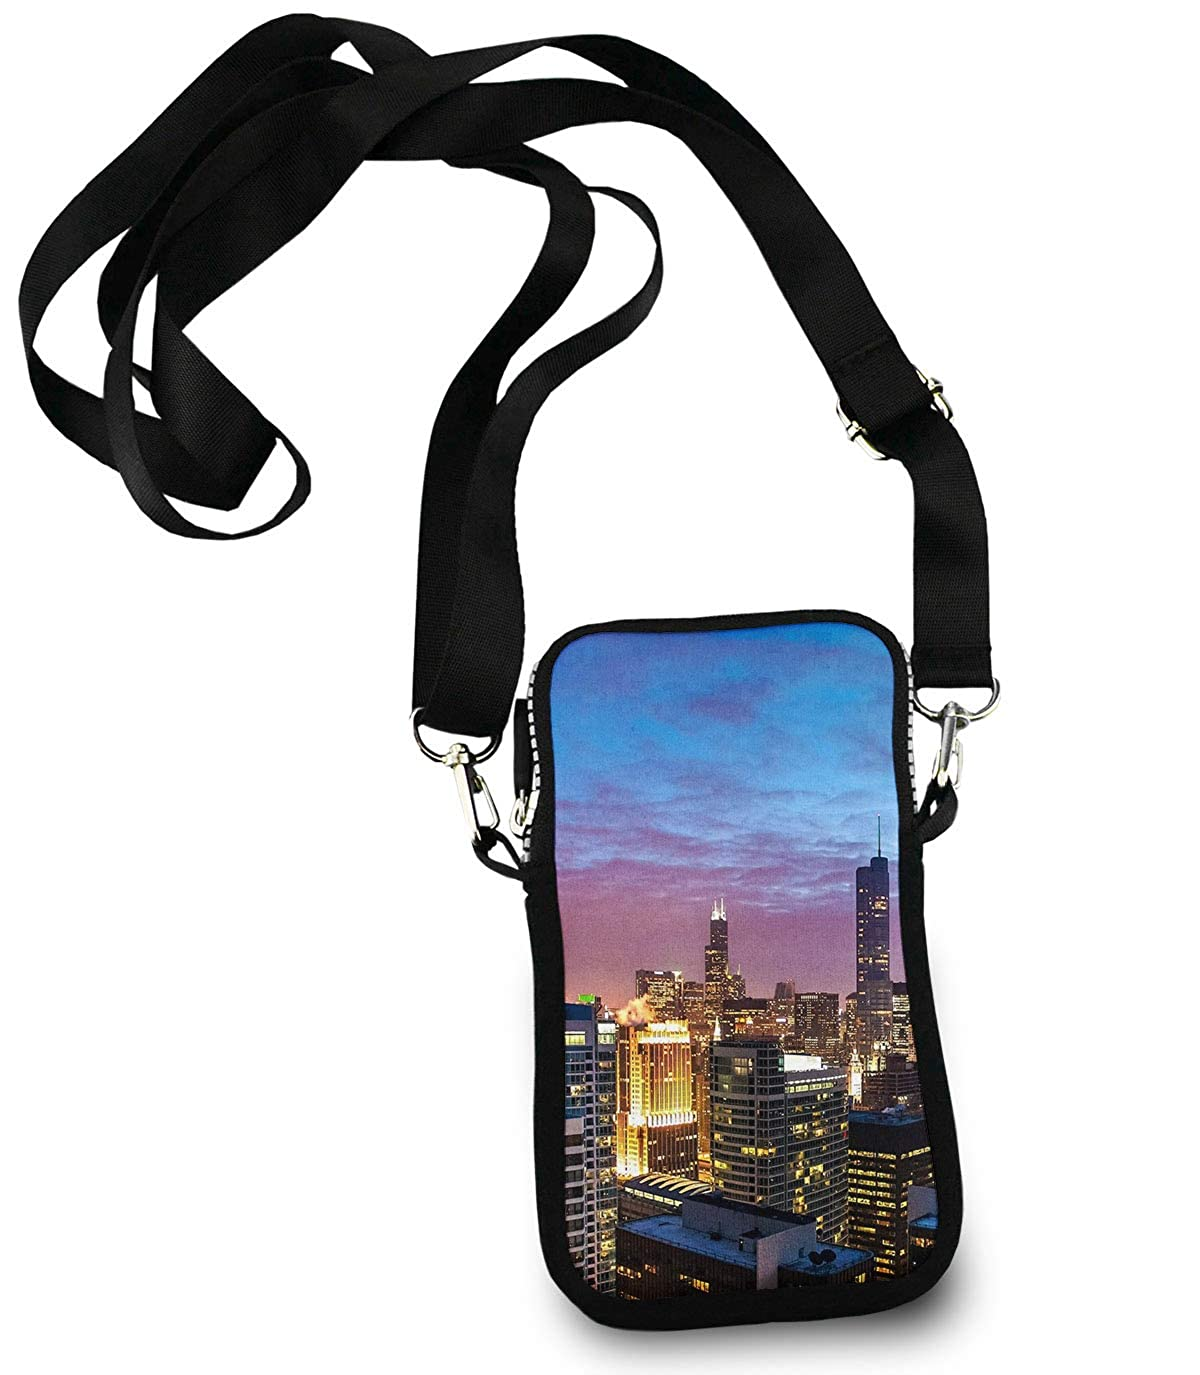 Unisex Small Crossbody Bag Cell Phone Purse Wallet Headphone Bag USA Chicago Skyline Night View